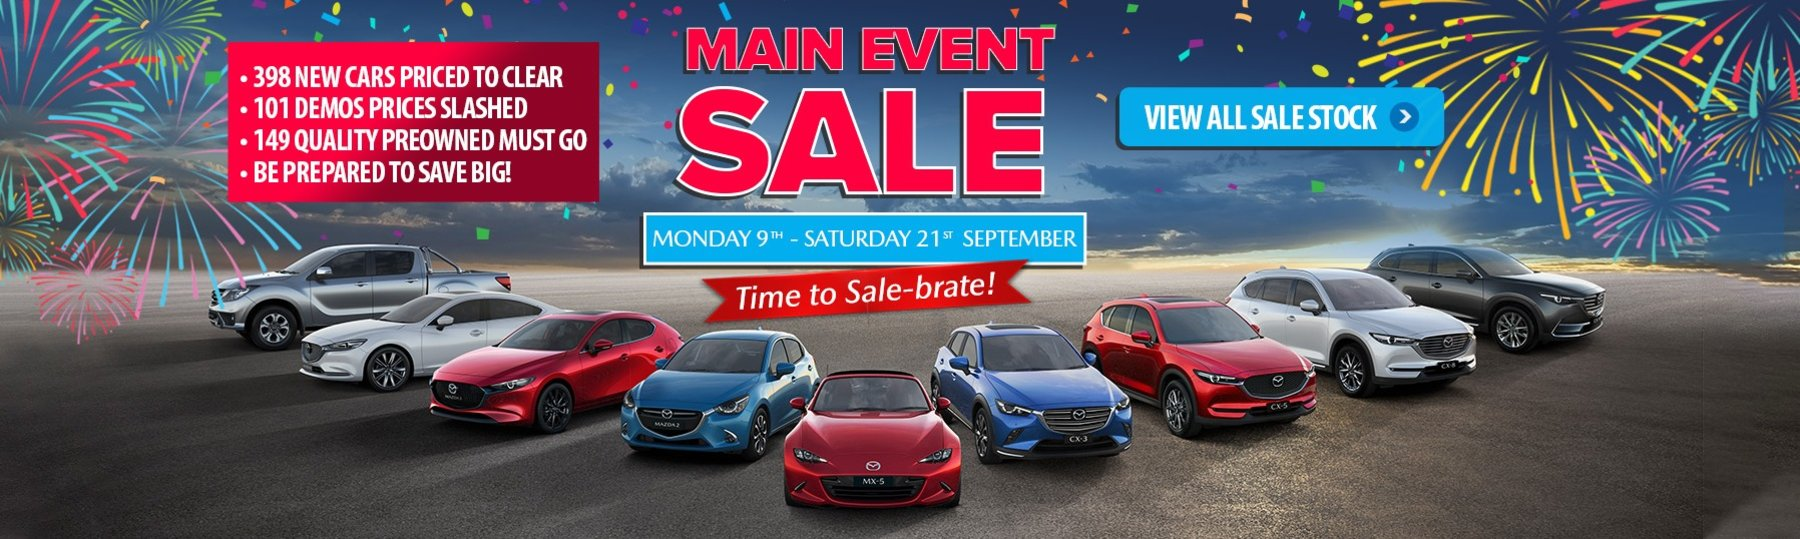 Penfold Mazda Main Event Sale